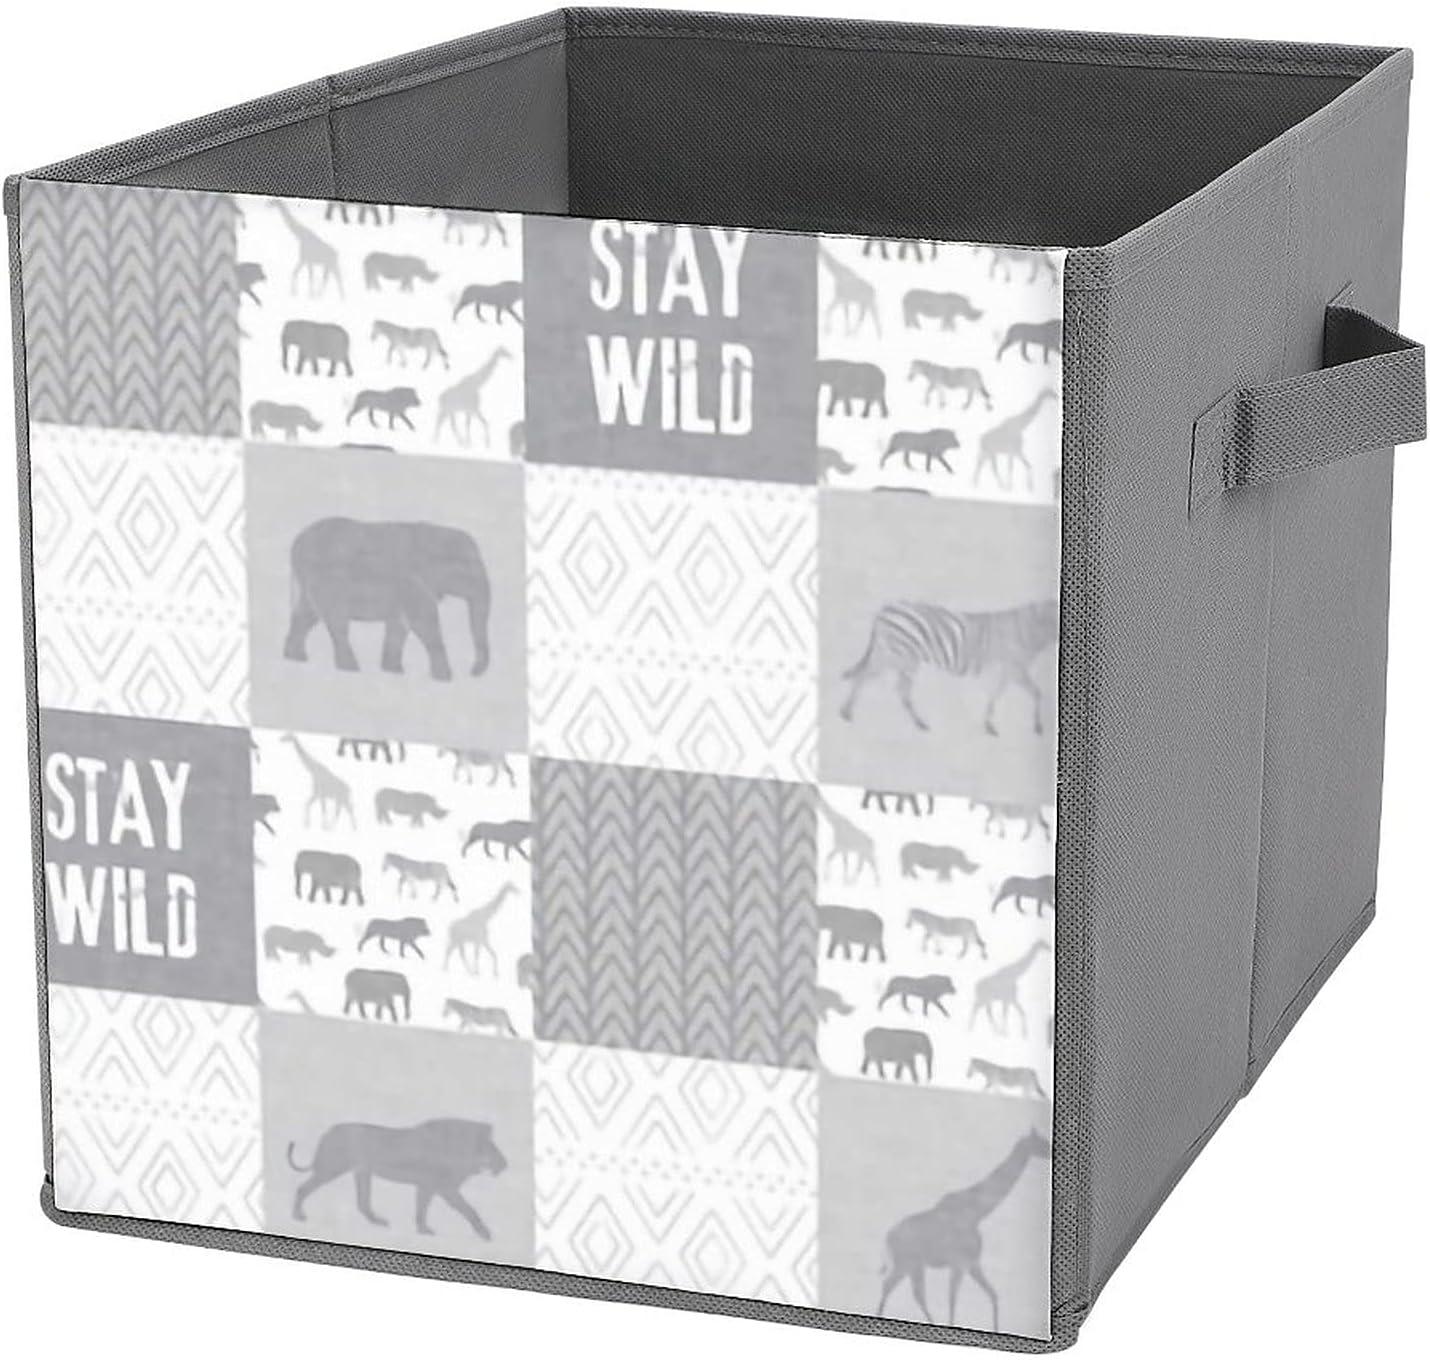 MMJUI Stay Wild Safari wholecloth Bins Folding Grey Popular products Coll Storage Max 63% OFF